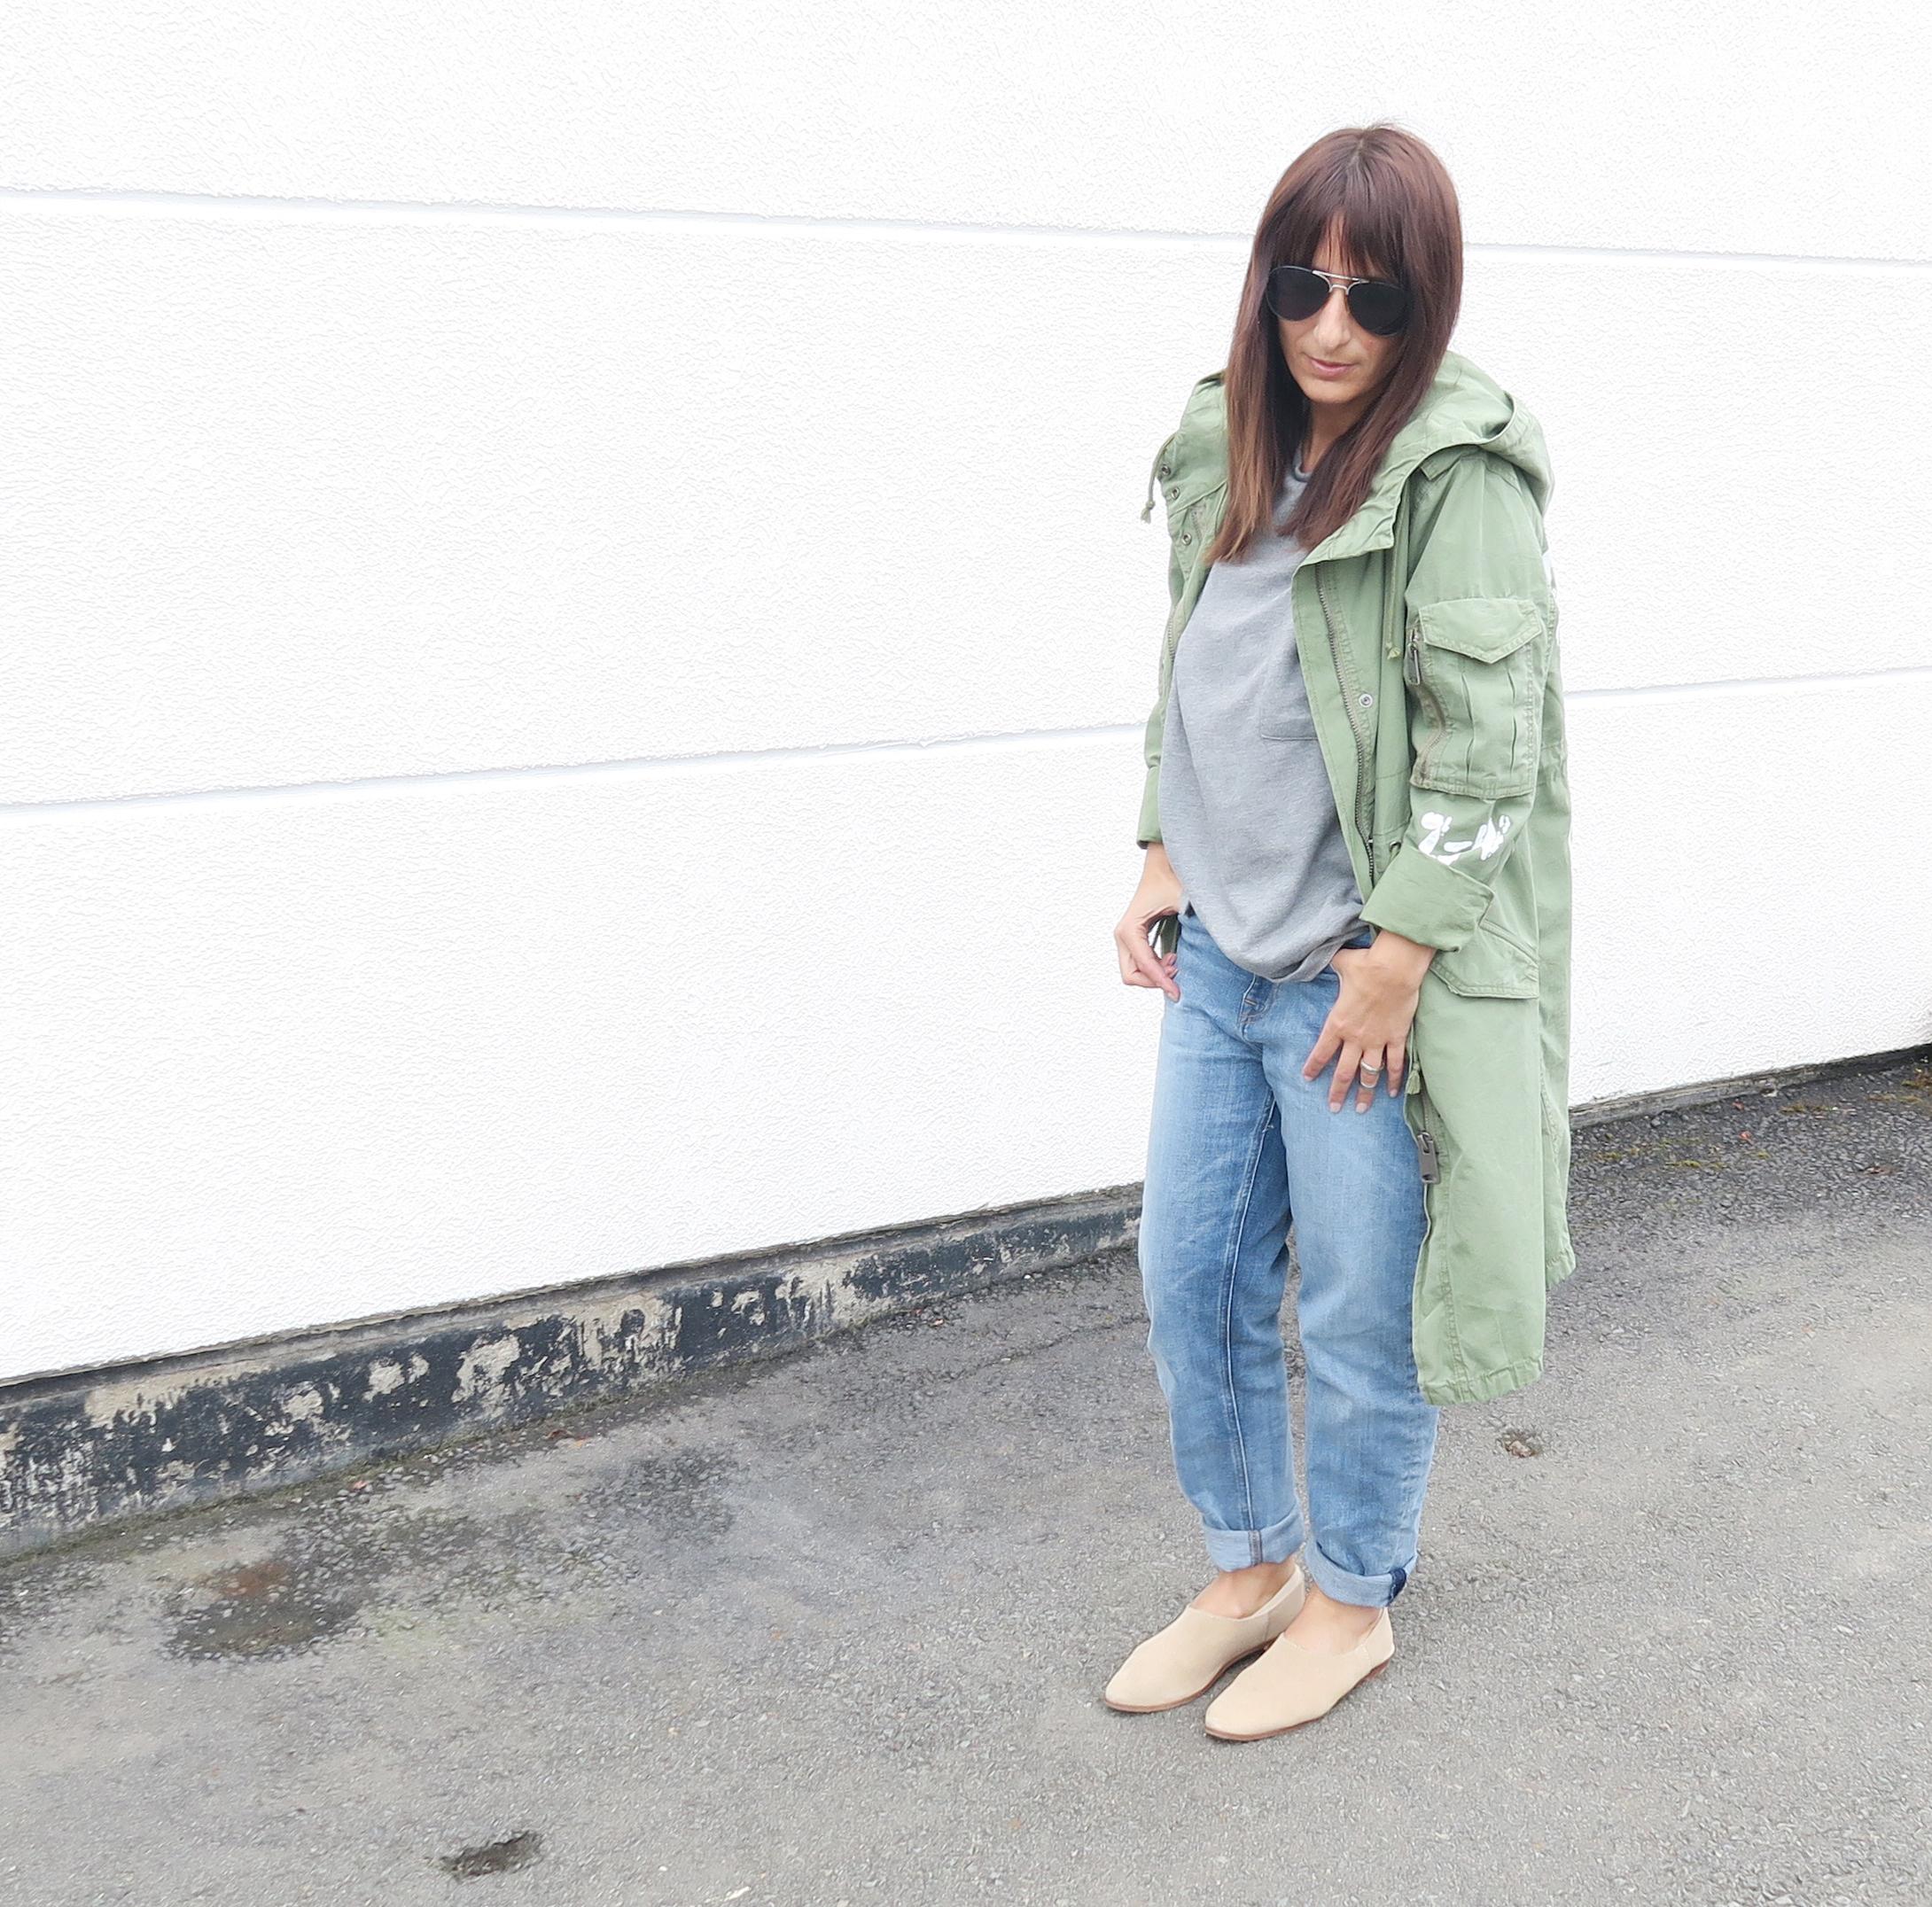 Parka-Streetstyle-Blogger-Modesalat-Fashion-style-look-zara-6